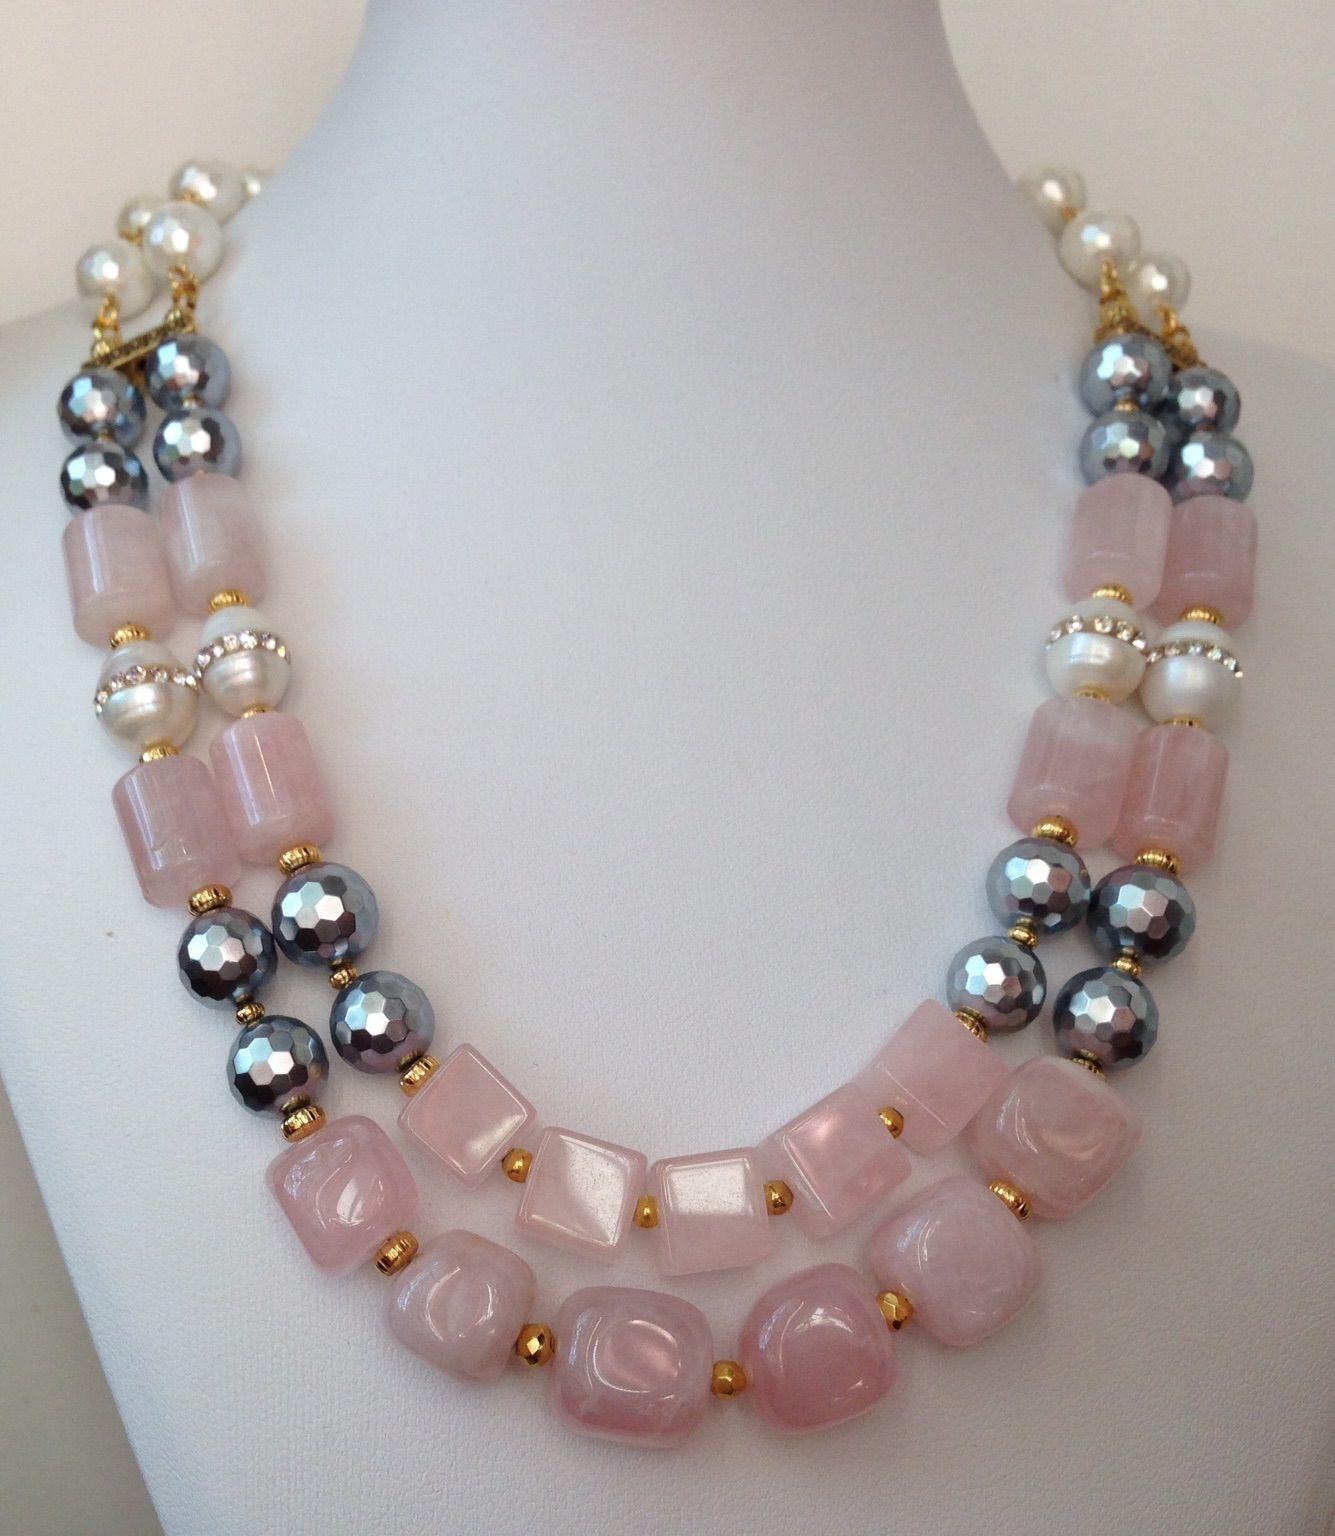 Rose Quartz & Shell Pearls Necklace